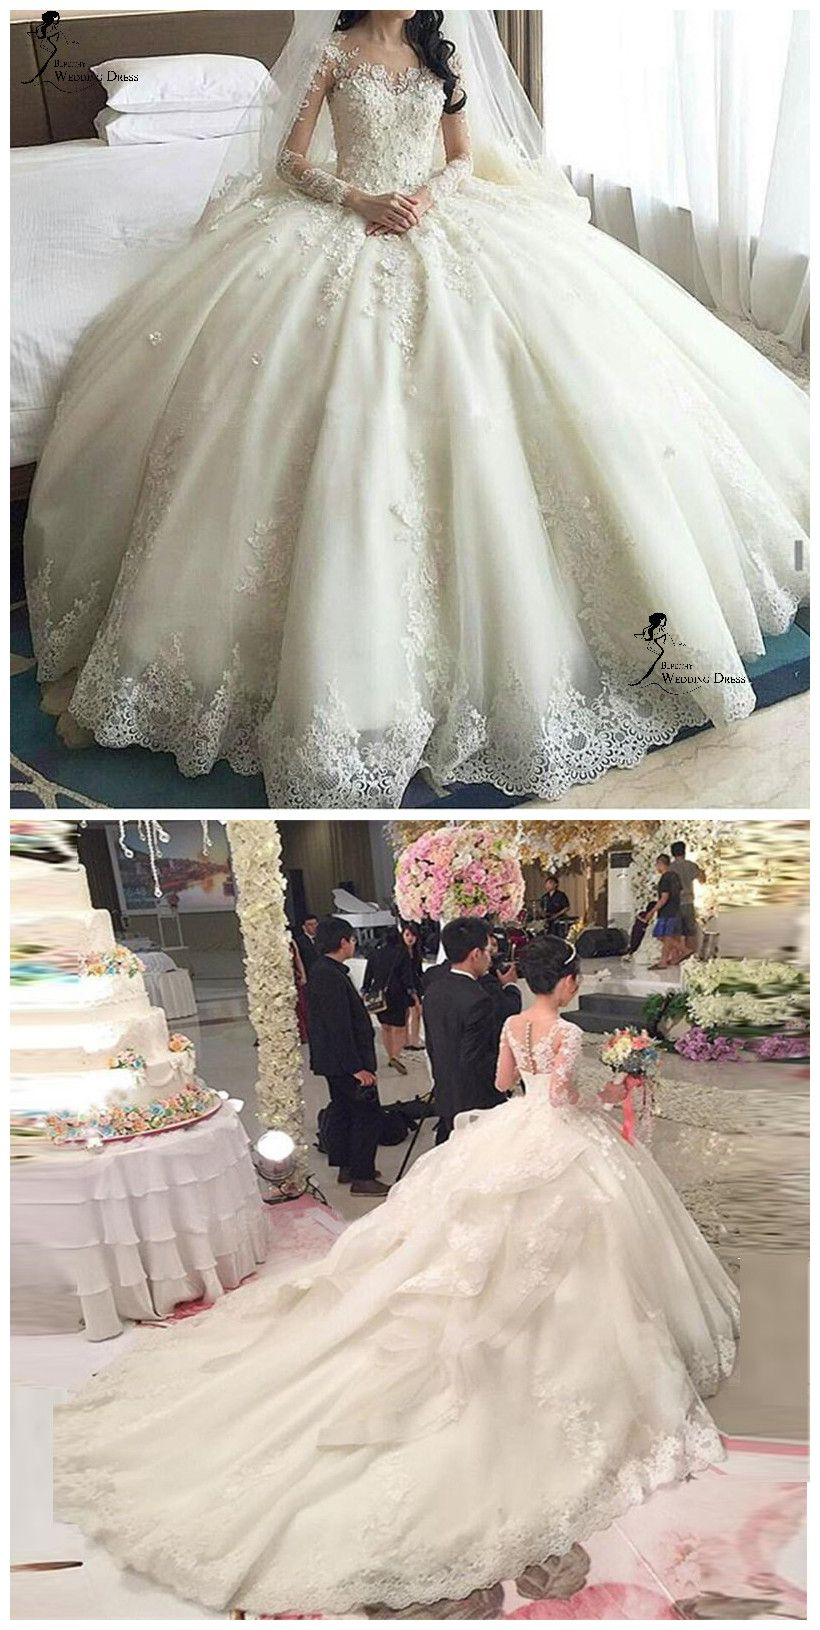 Long lace wedding dress  luxury wedding dressesWomenus Long Sleeve Lace wedding dressesBall